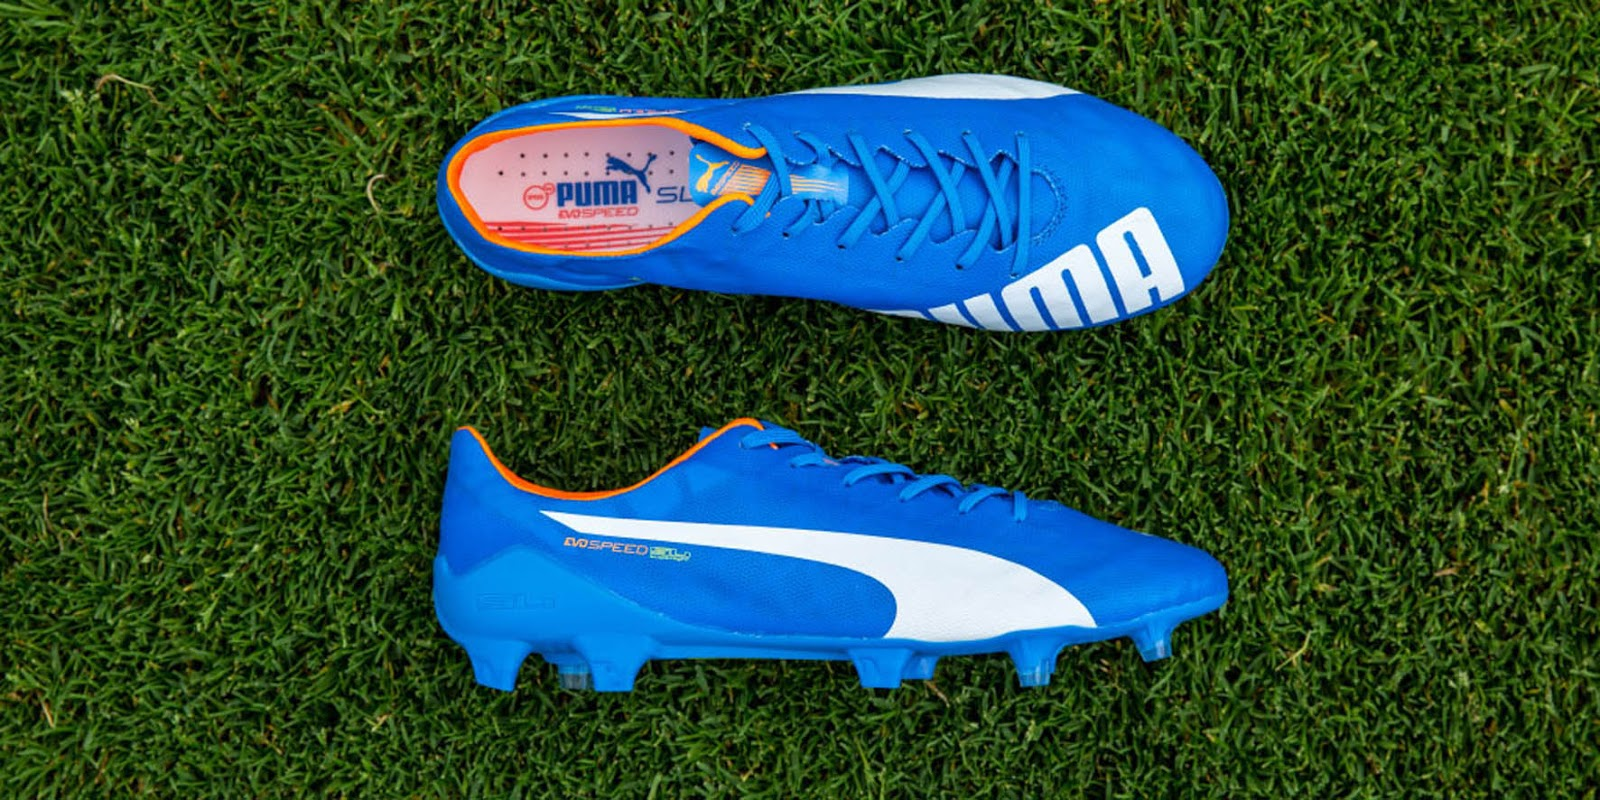 c420bca7e2b8 Puma evoSPEED SL Electric Blue   Lemonade   White   Orange Clown Fish